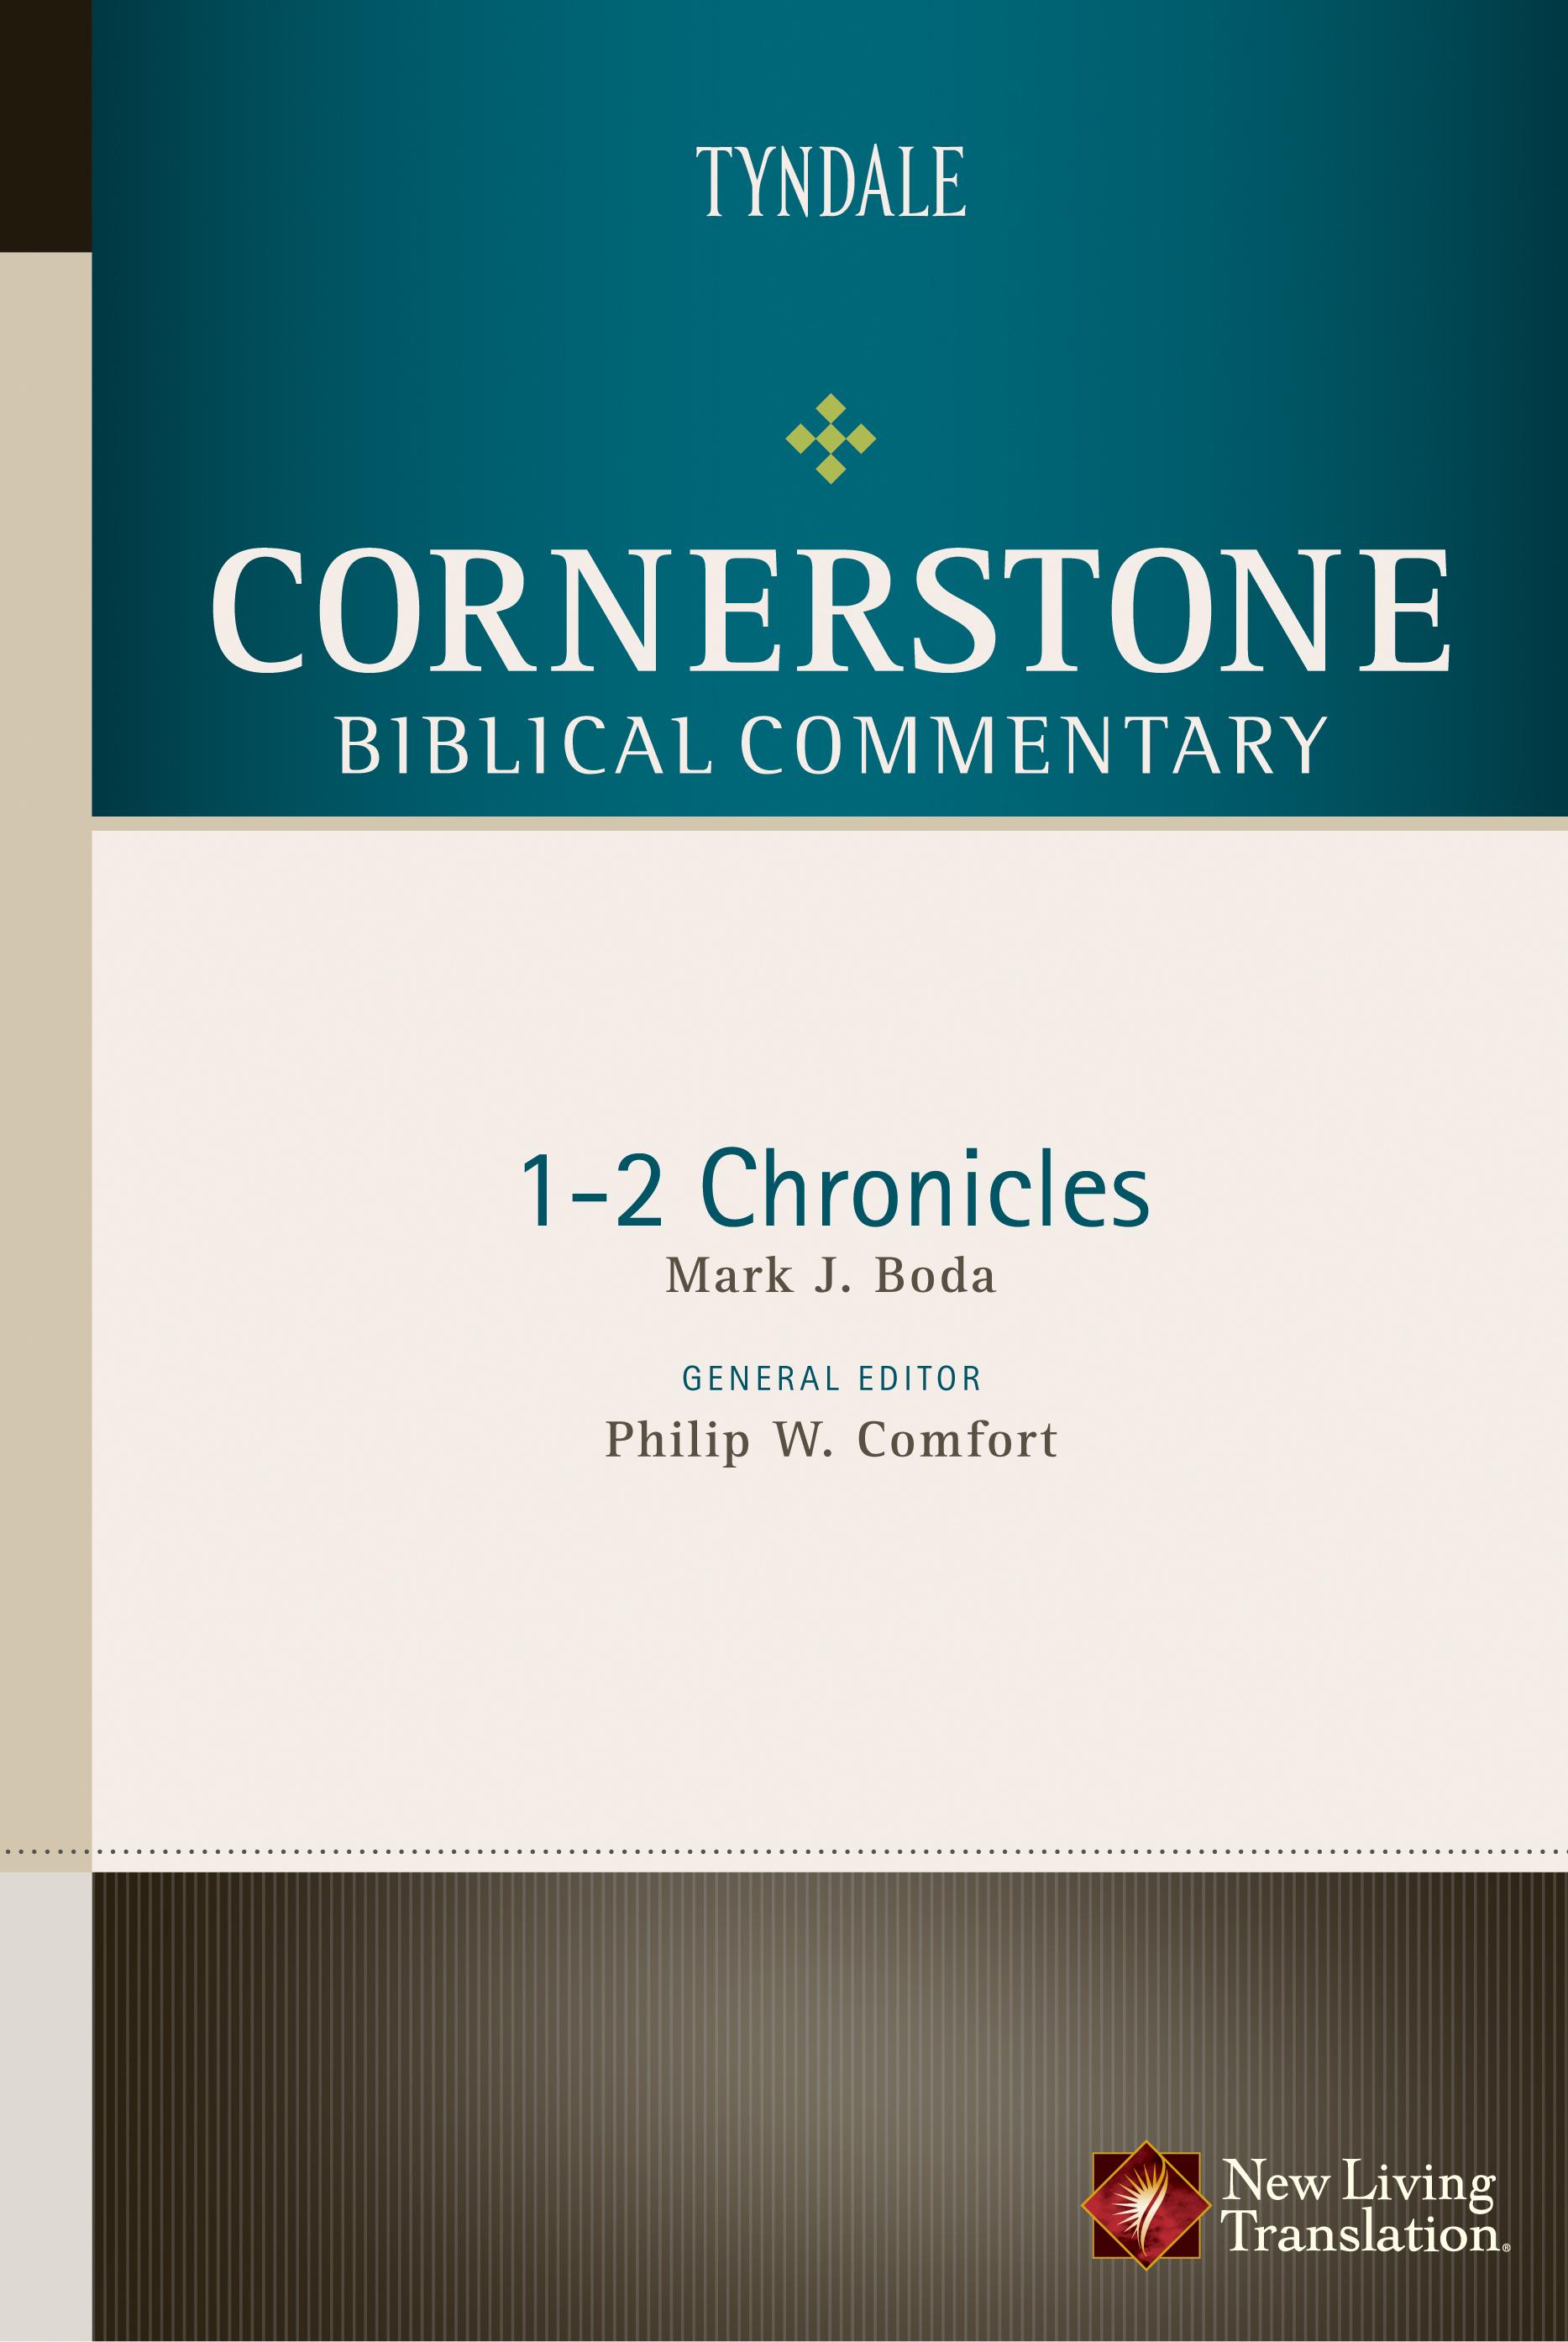 1-2 Chronicles